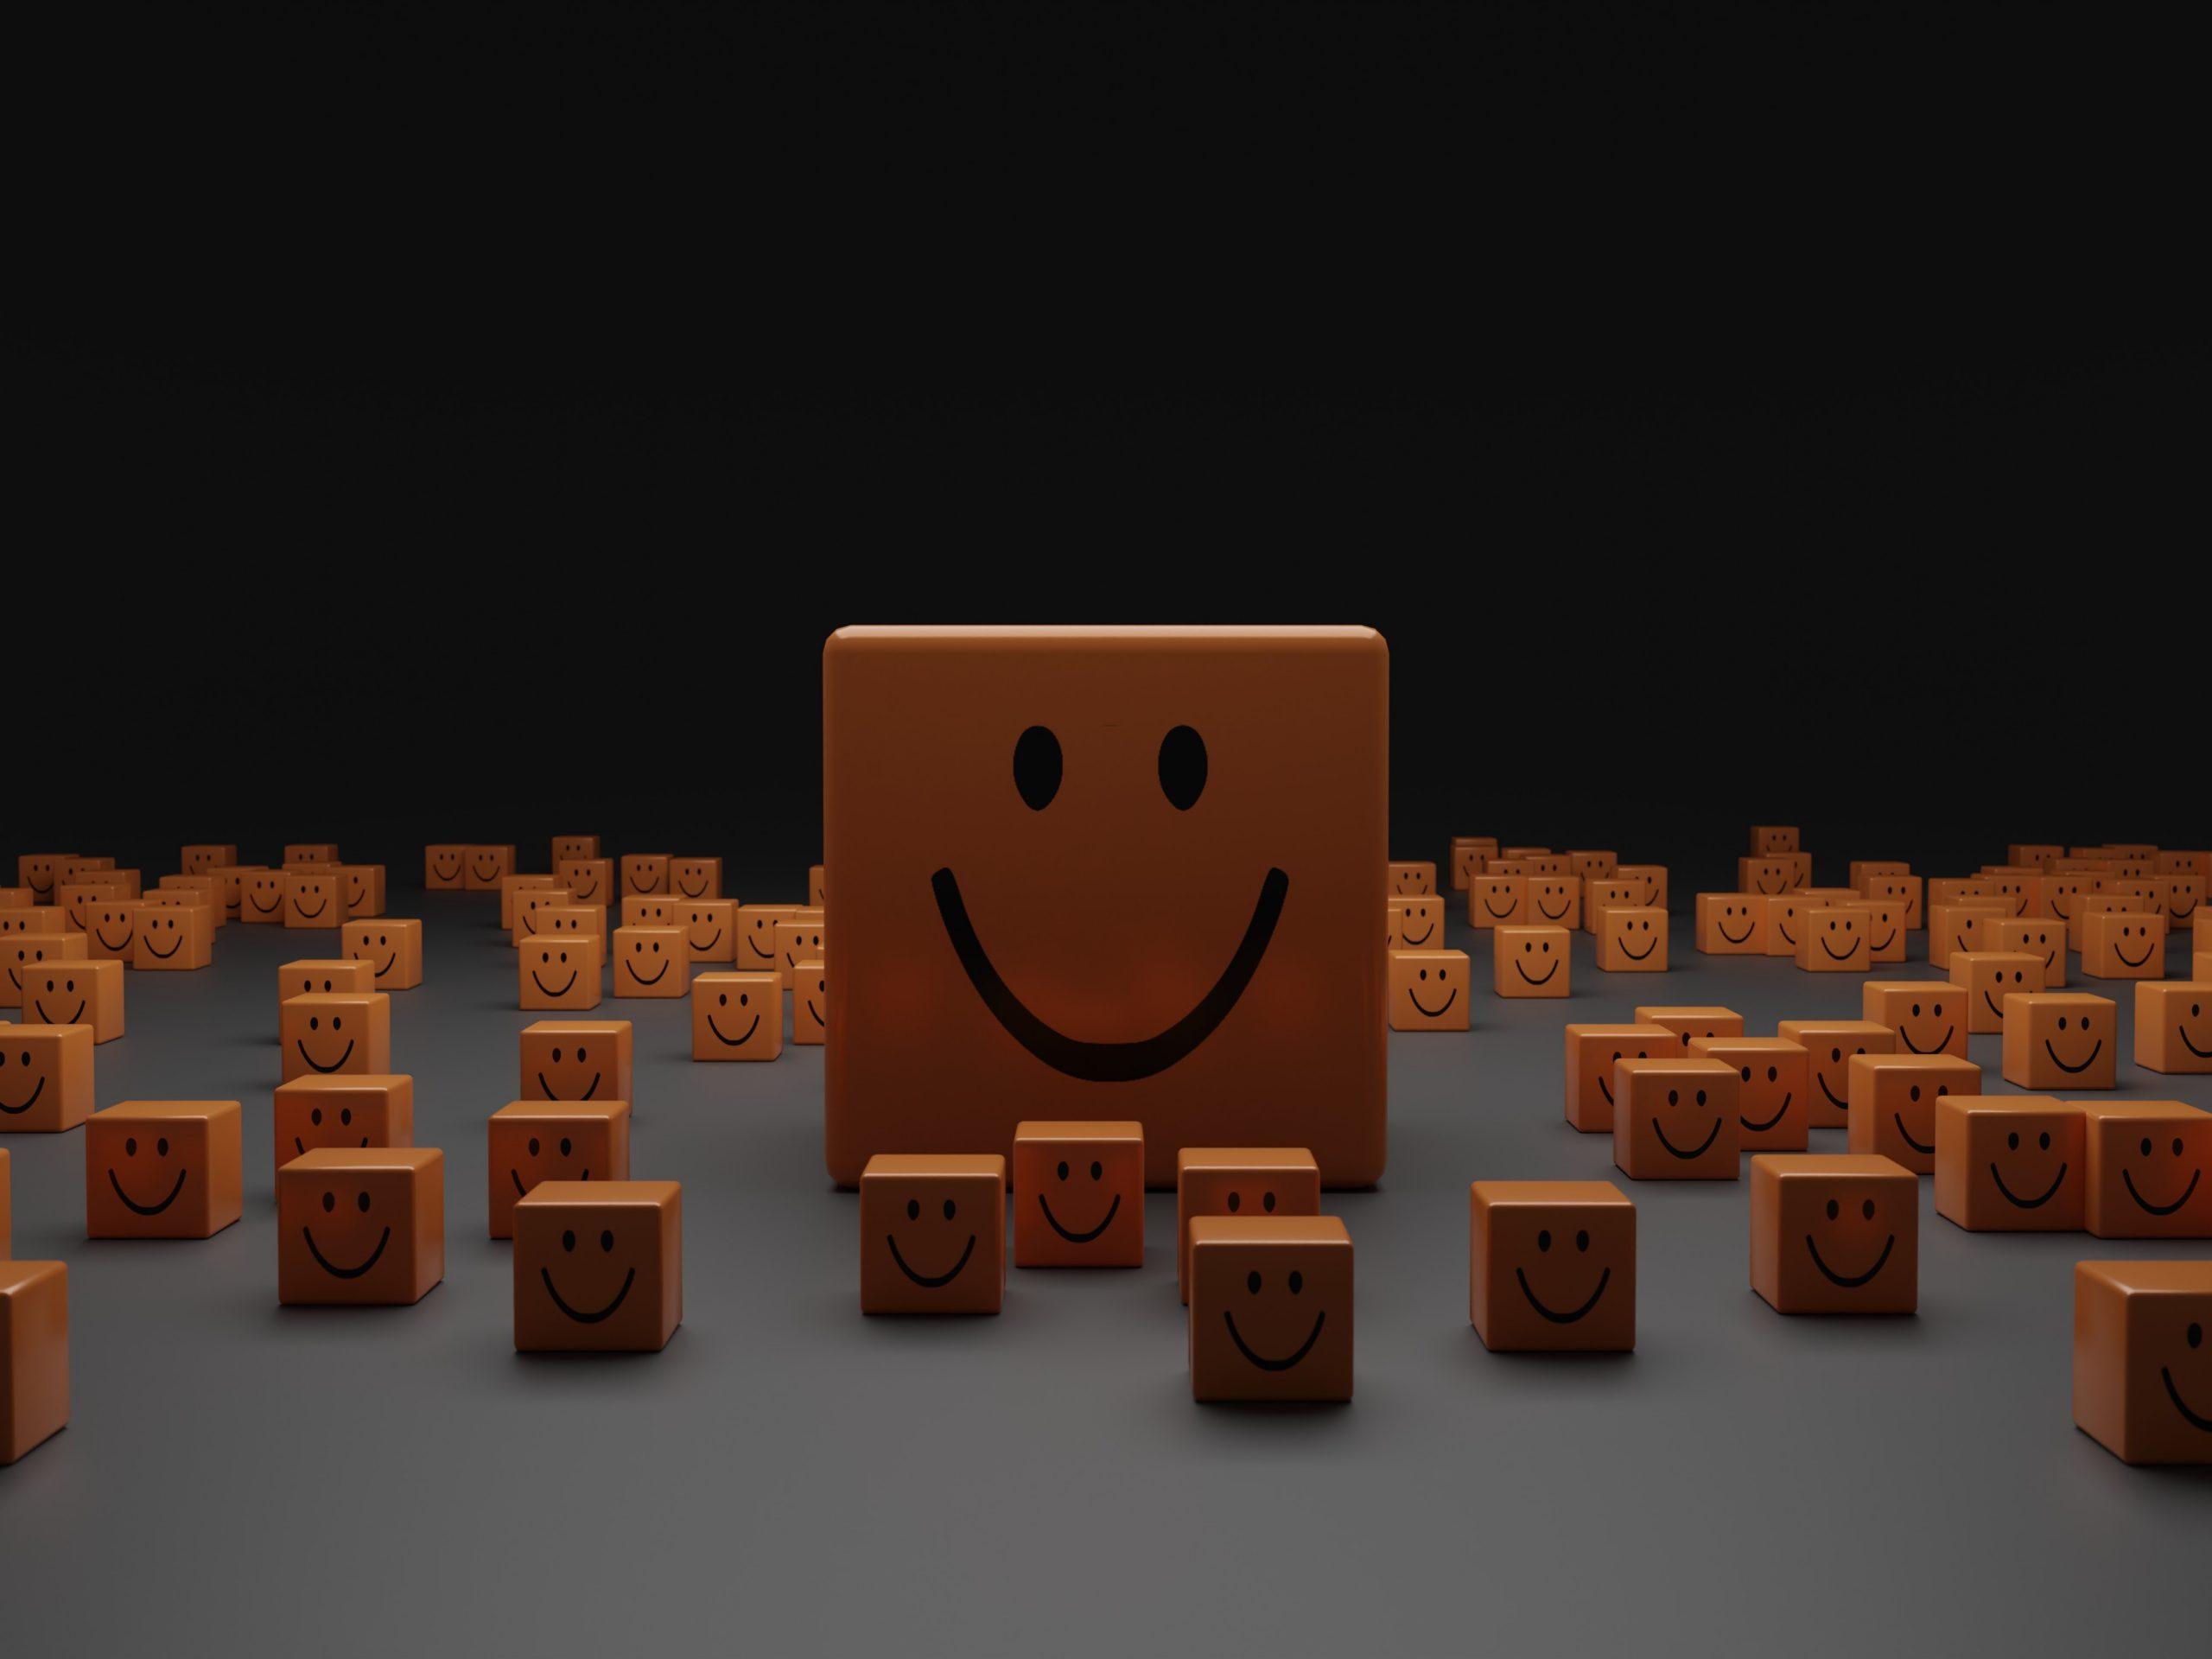 blocks of wood smiling